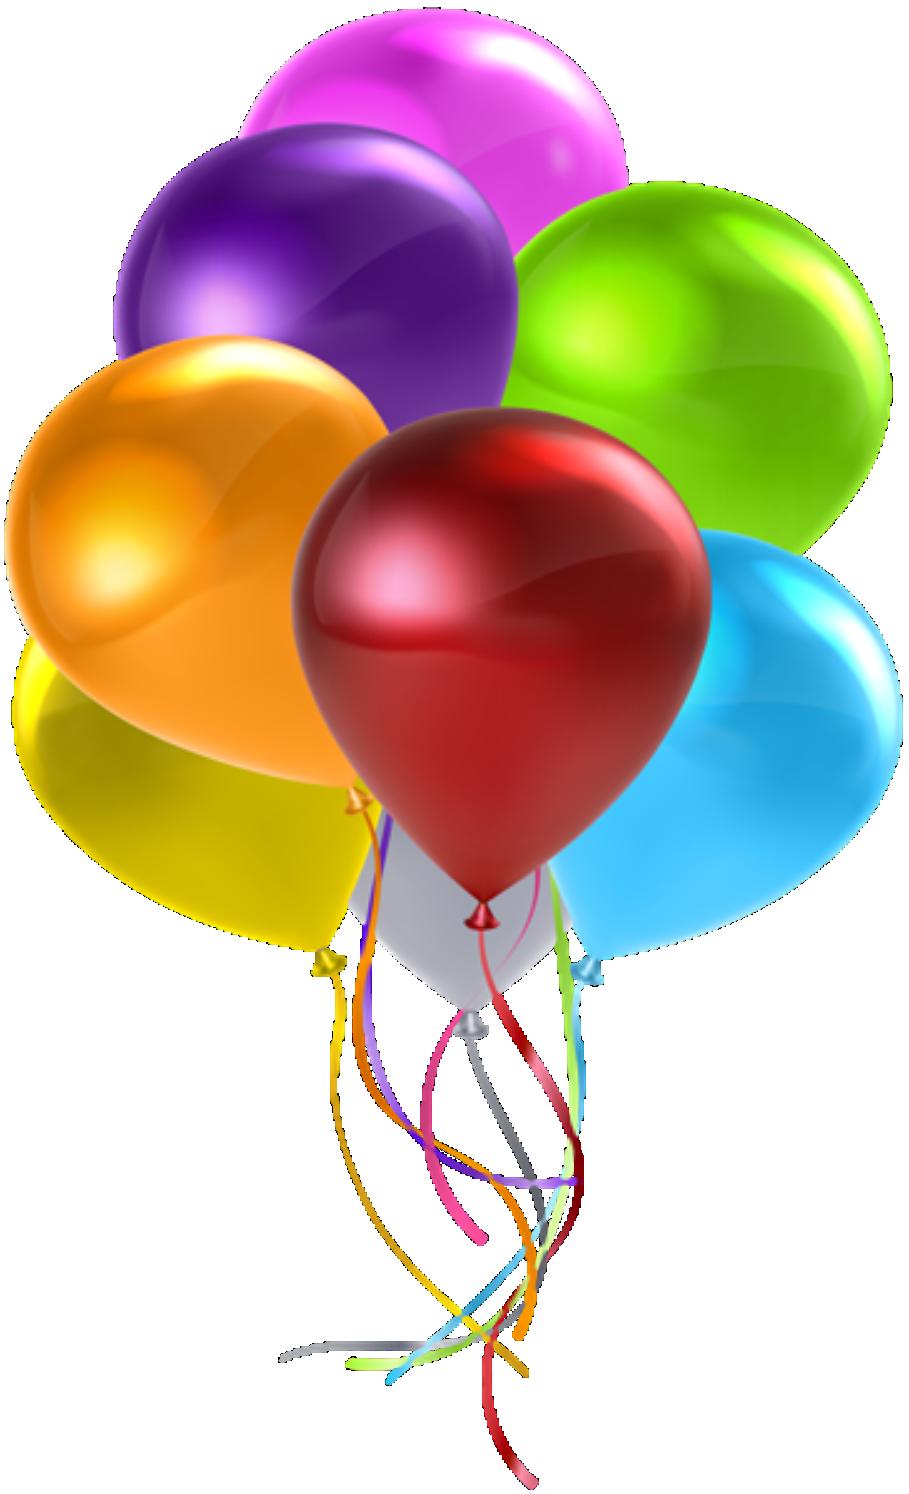 Baloes Conjunto De Baloes Coloridos 3 Png Imagens E Moldes Com Br